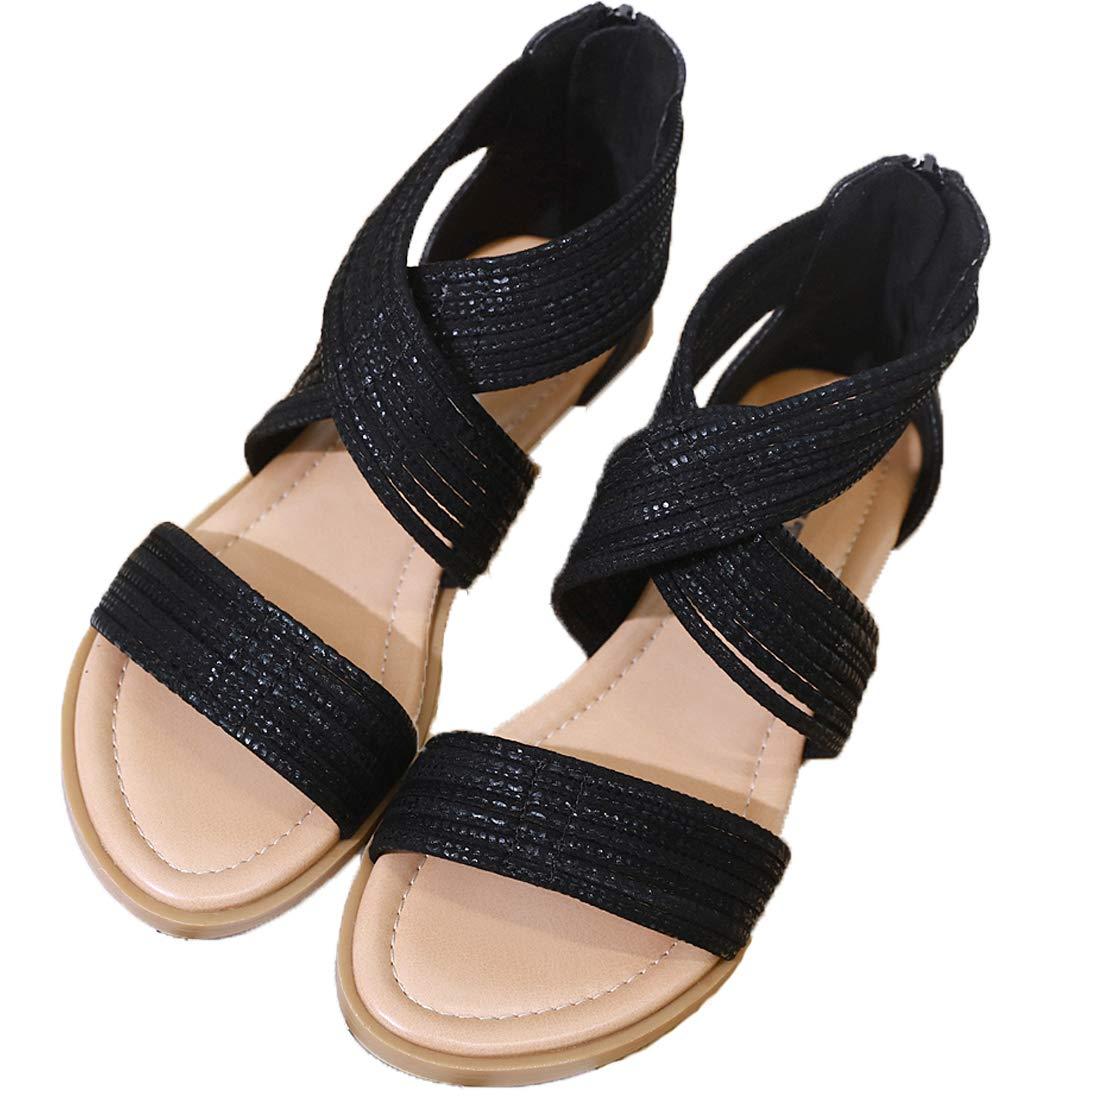 Yozai Womens Summer Crisscross Ankle Strap Flat Sandals Shoes